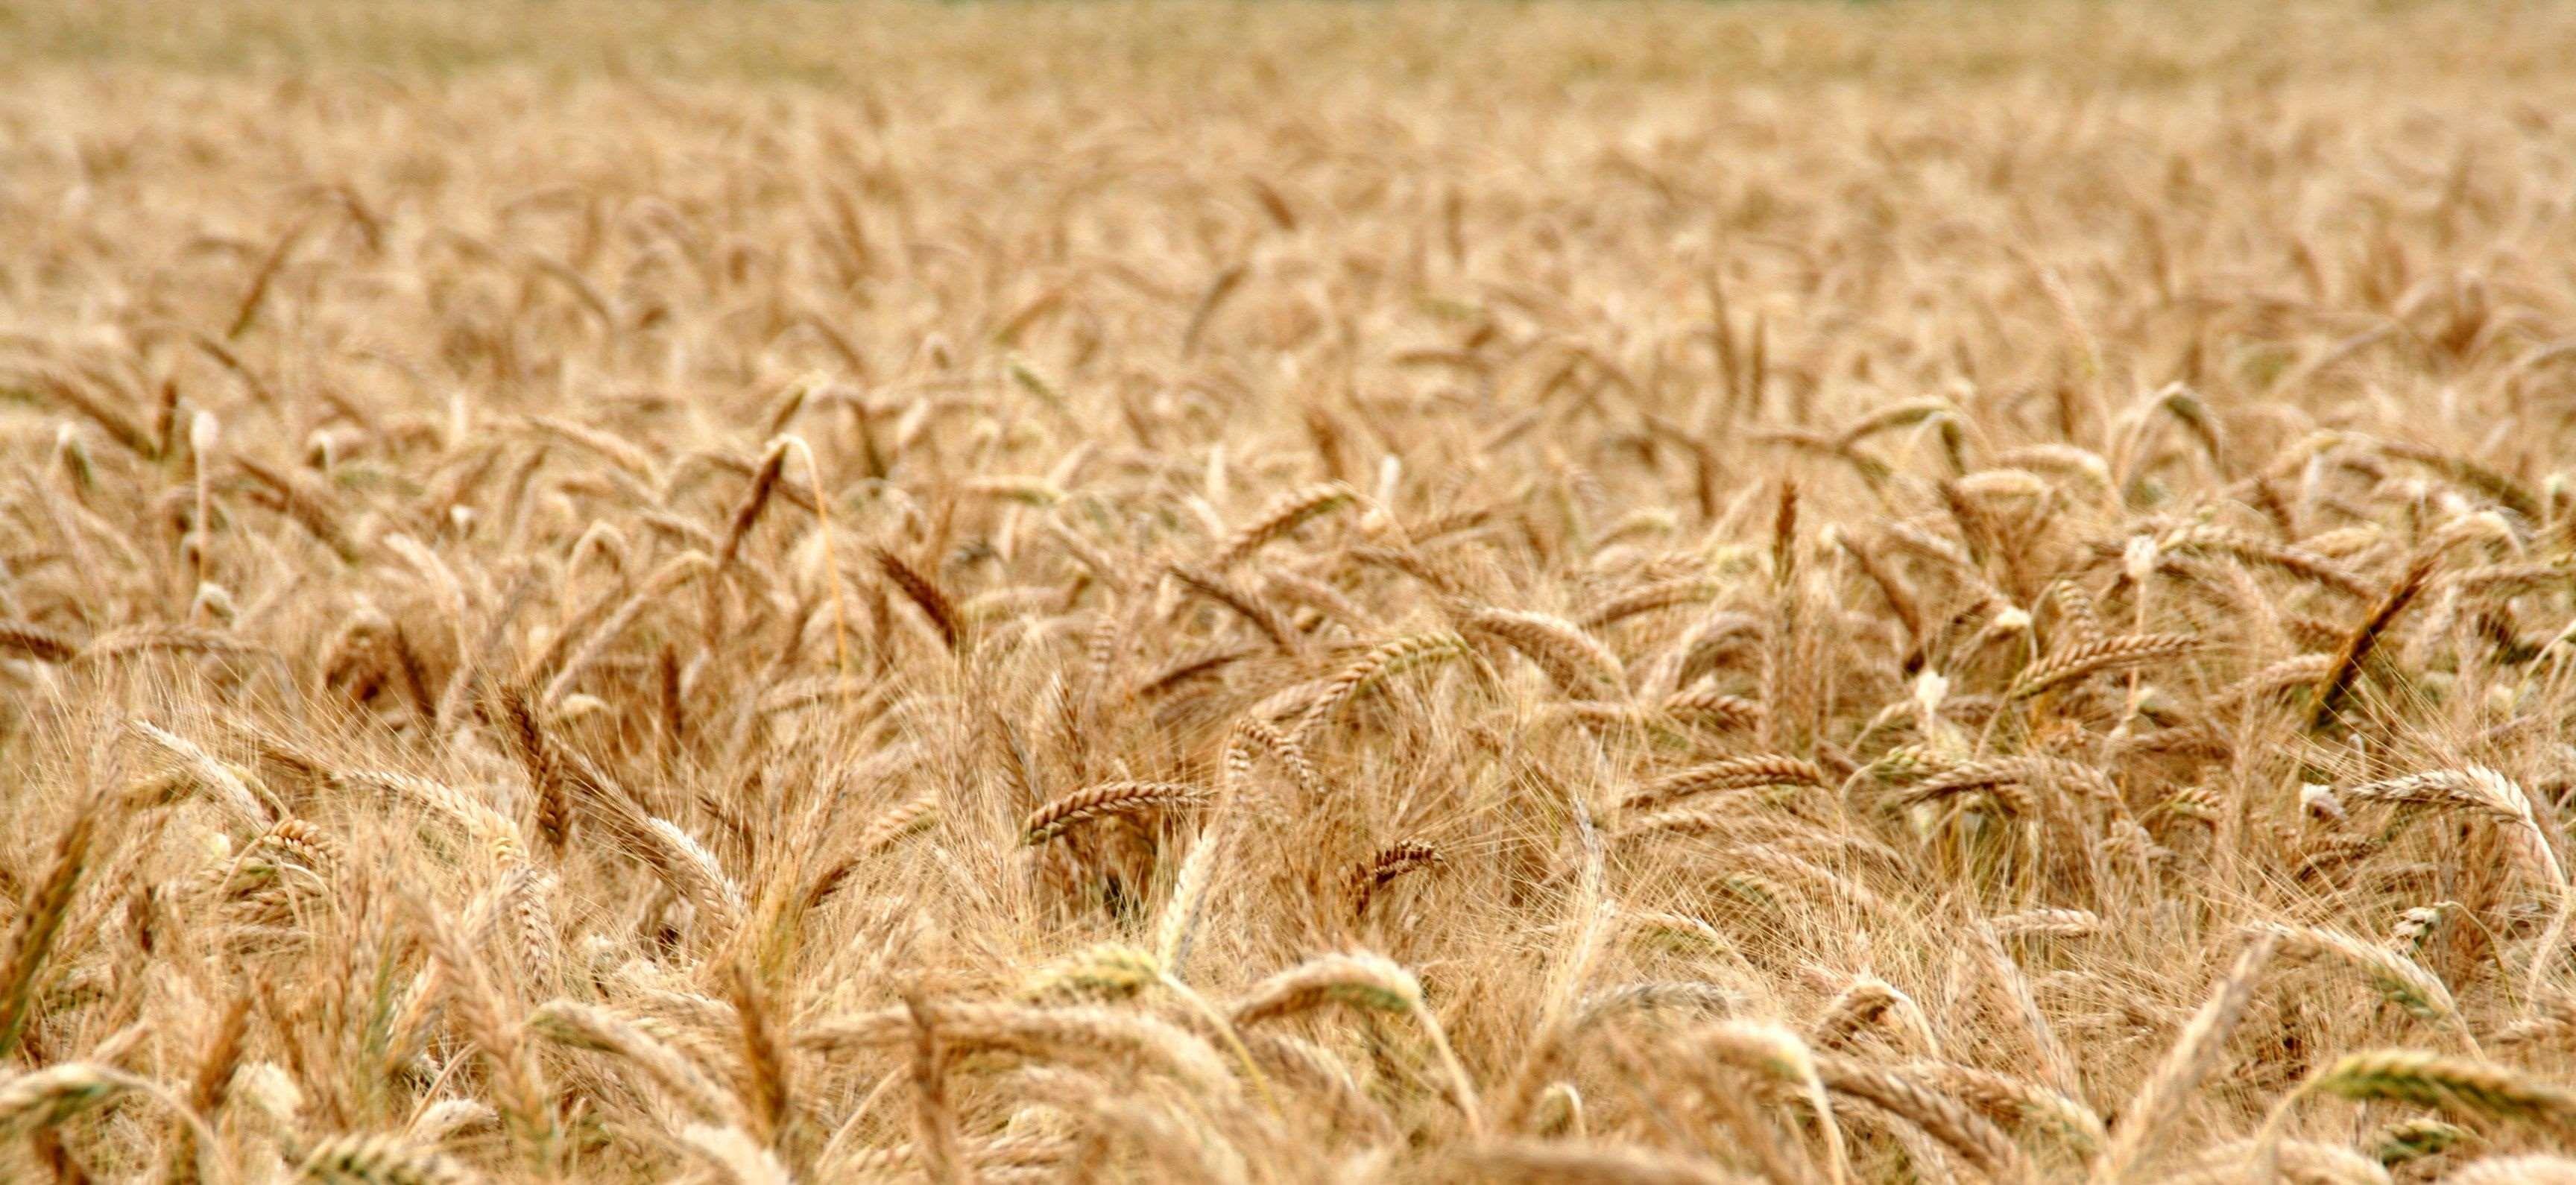 bake #bread #cereals #cornfield #cute #eat #field #flour #food ...